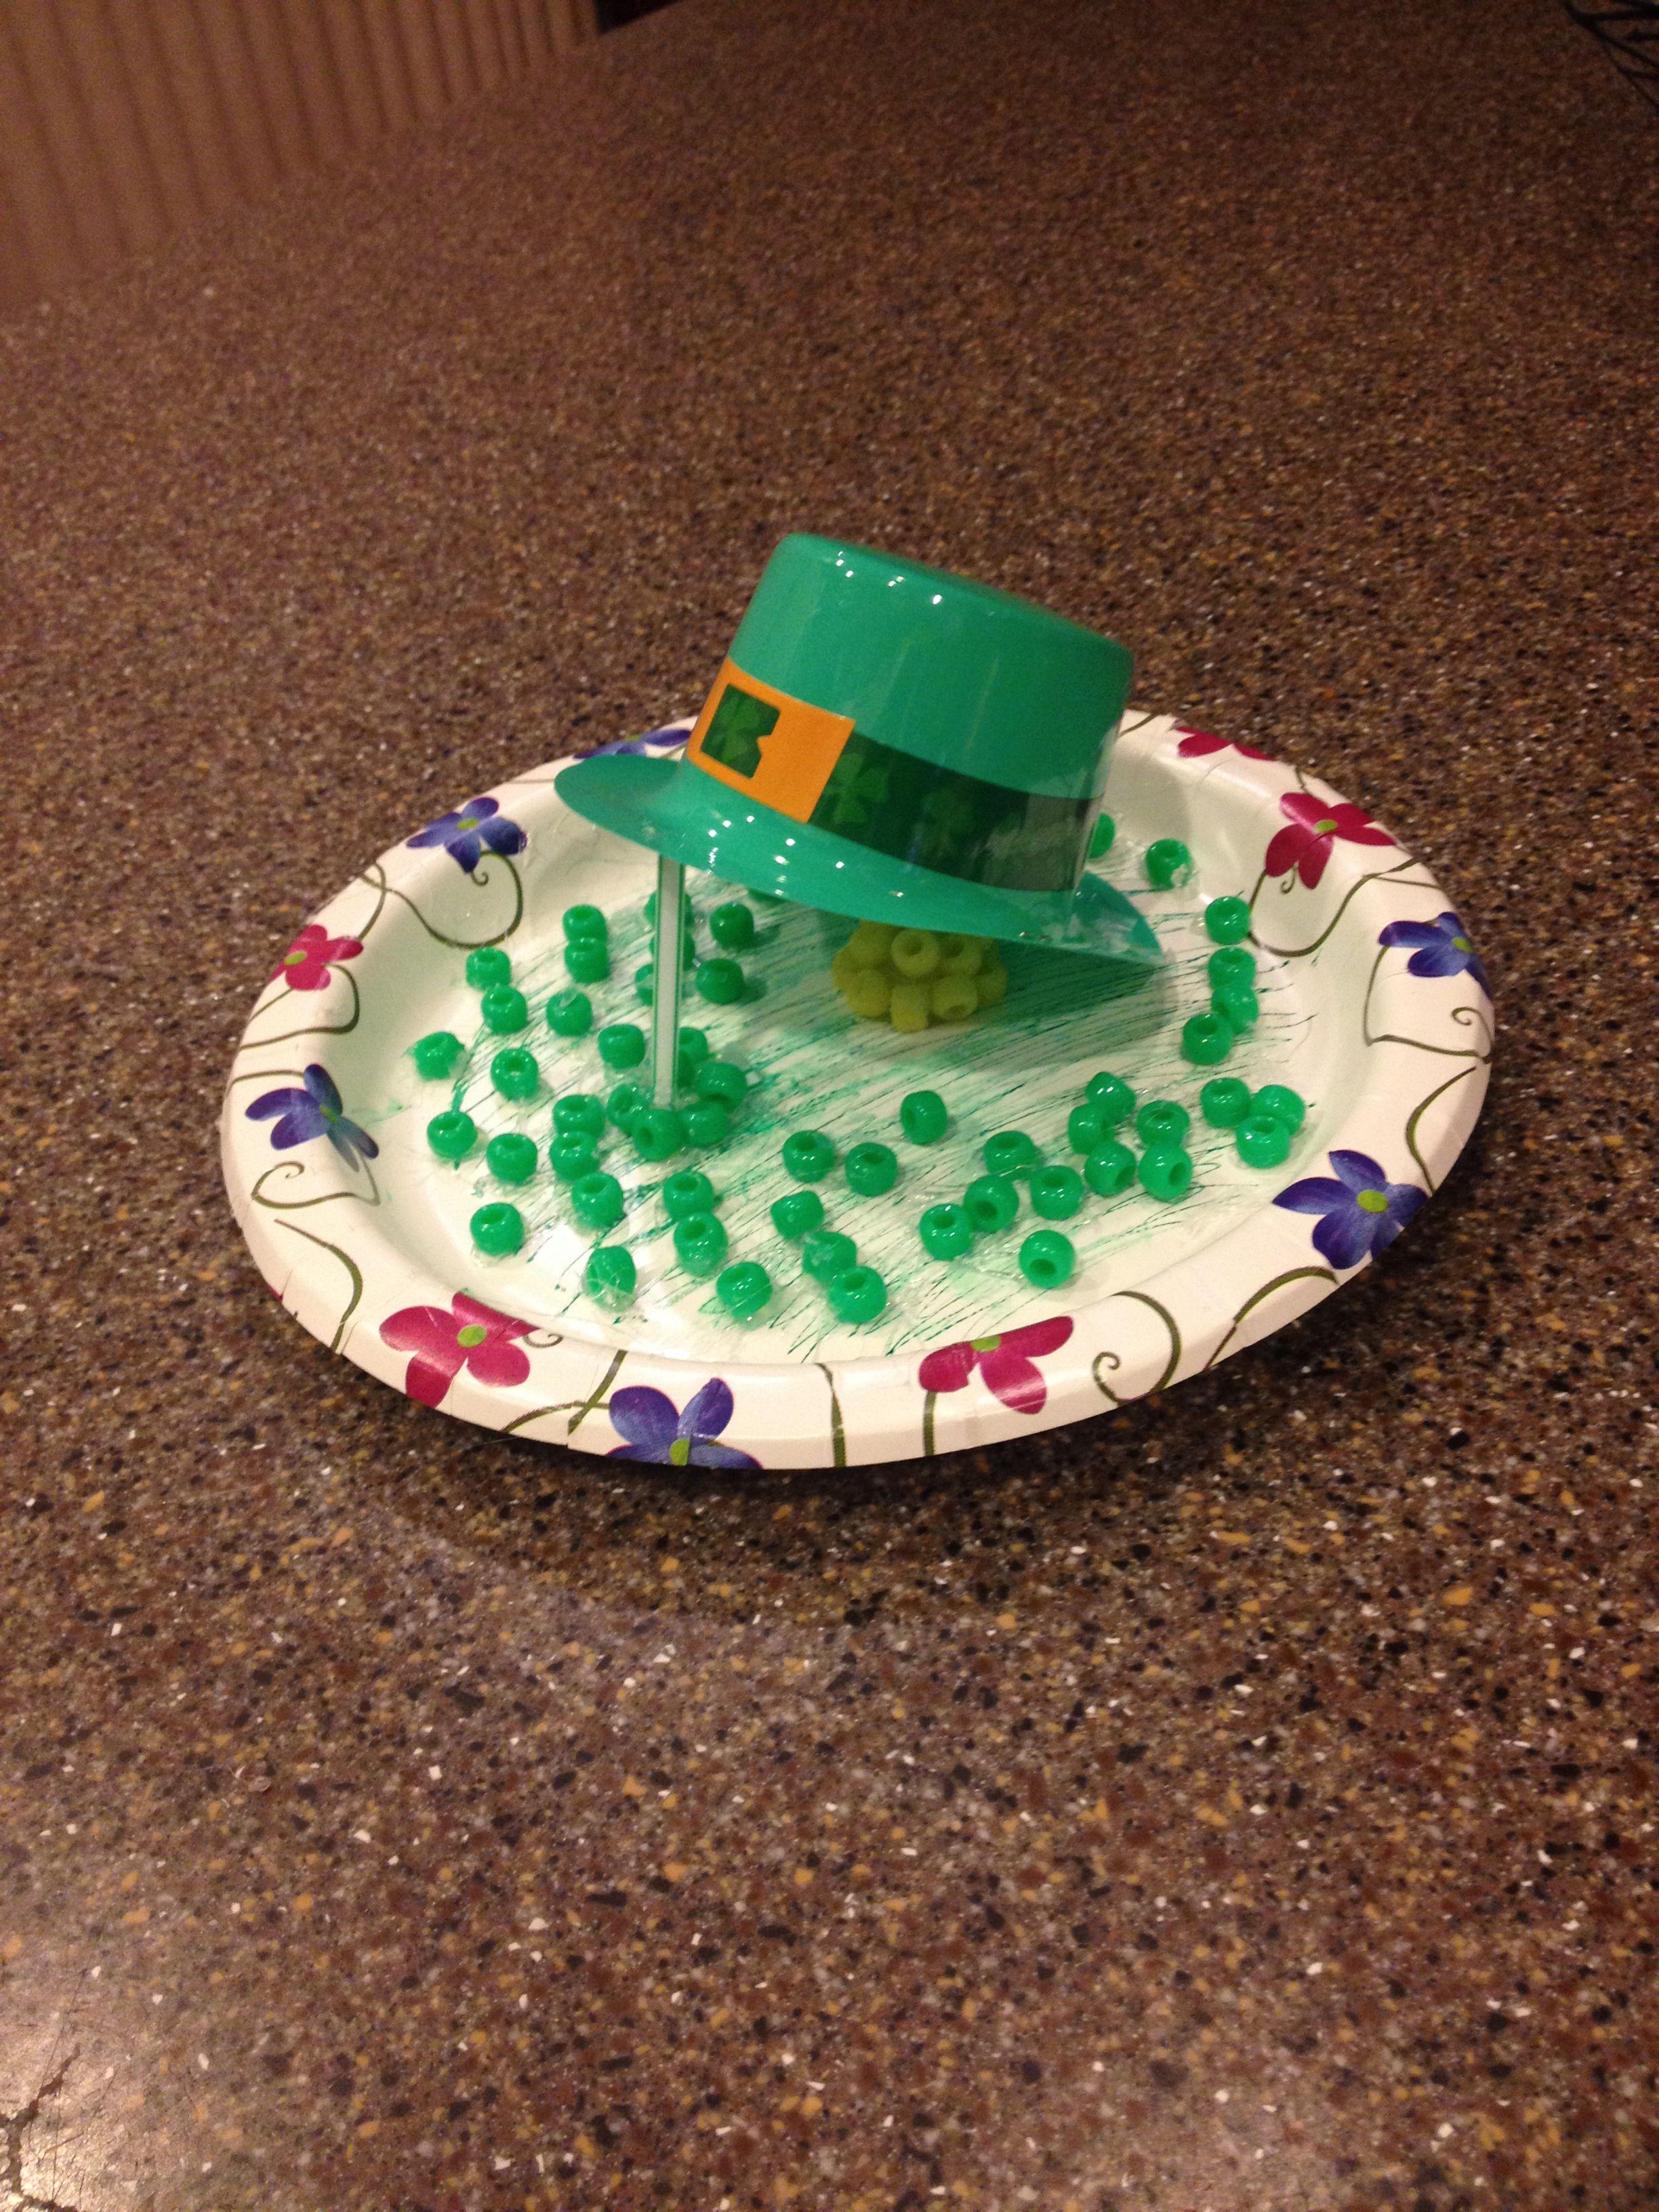 9:30 night before St. Patricks Day Leprechaun trap. Plate, bendable straw, hot glue, beads & a plastic mini hat. #leprechauntrap #stpatricksday #fastandeasy